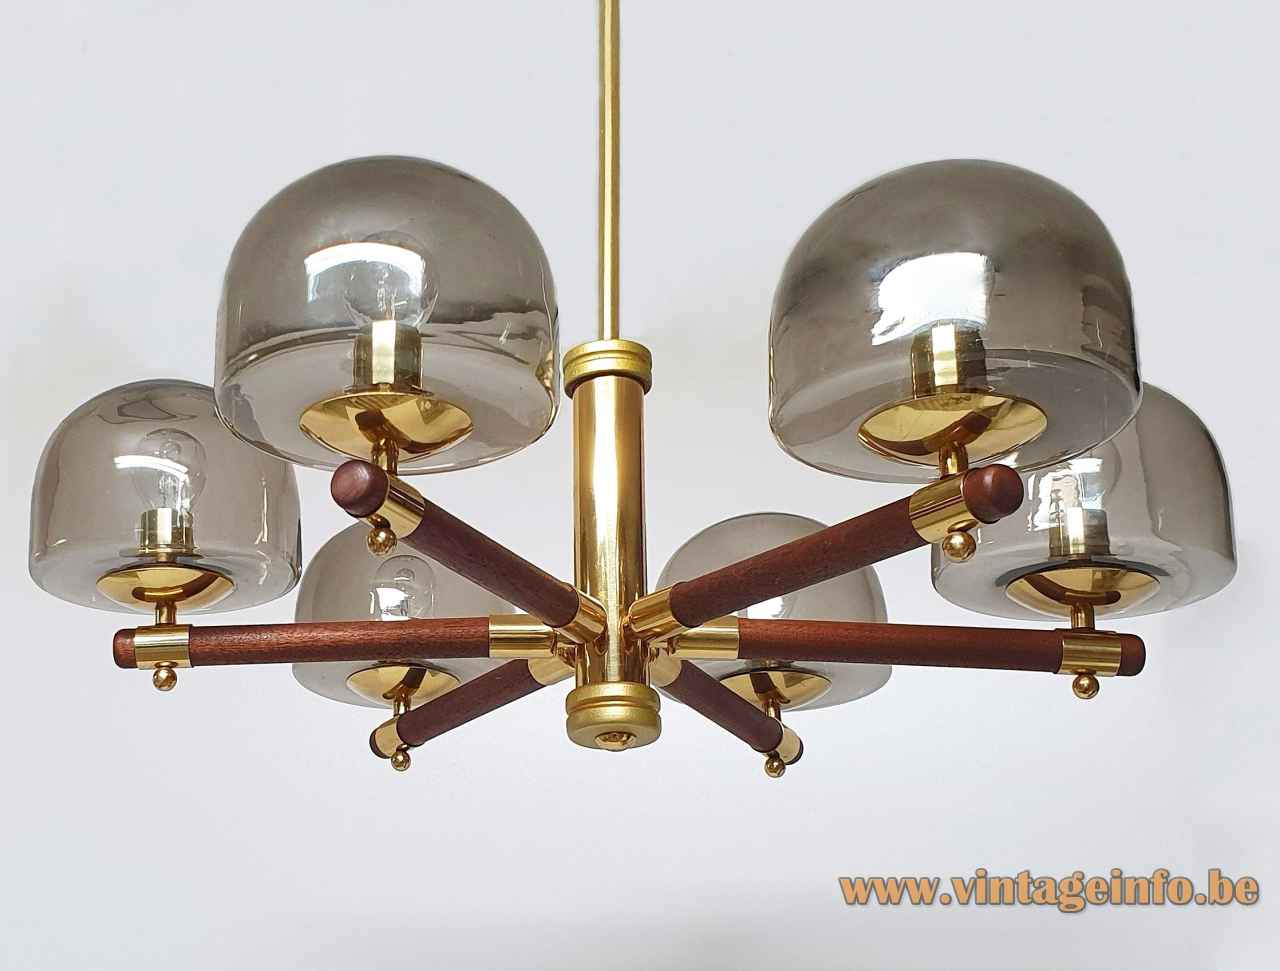 Berlin Leuchten smoked glass chandelier 6 globes lampshades brass & wood rods 1970s Germany E14 sockets